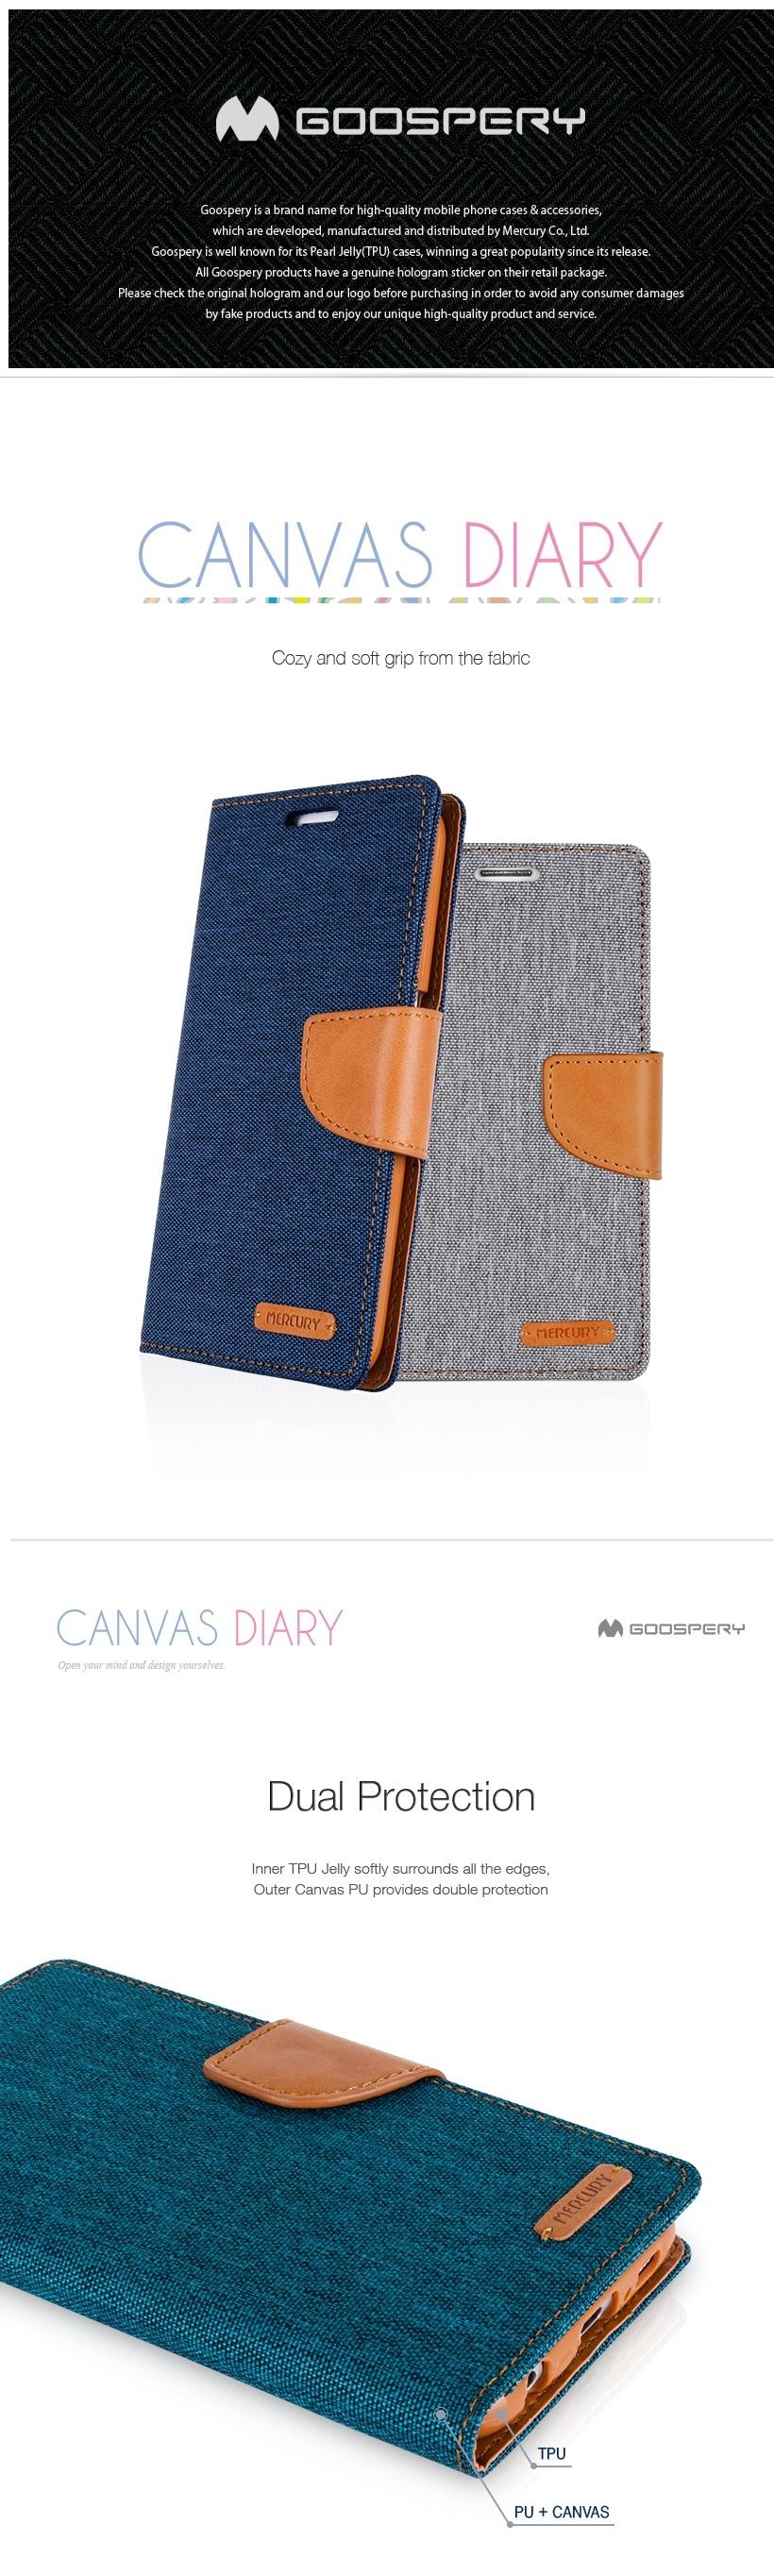 Buy Originalmercury Goospery Canvas Diary Case Samsung Galaxy V Iphone 7 Blue Highlights